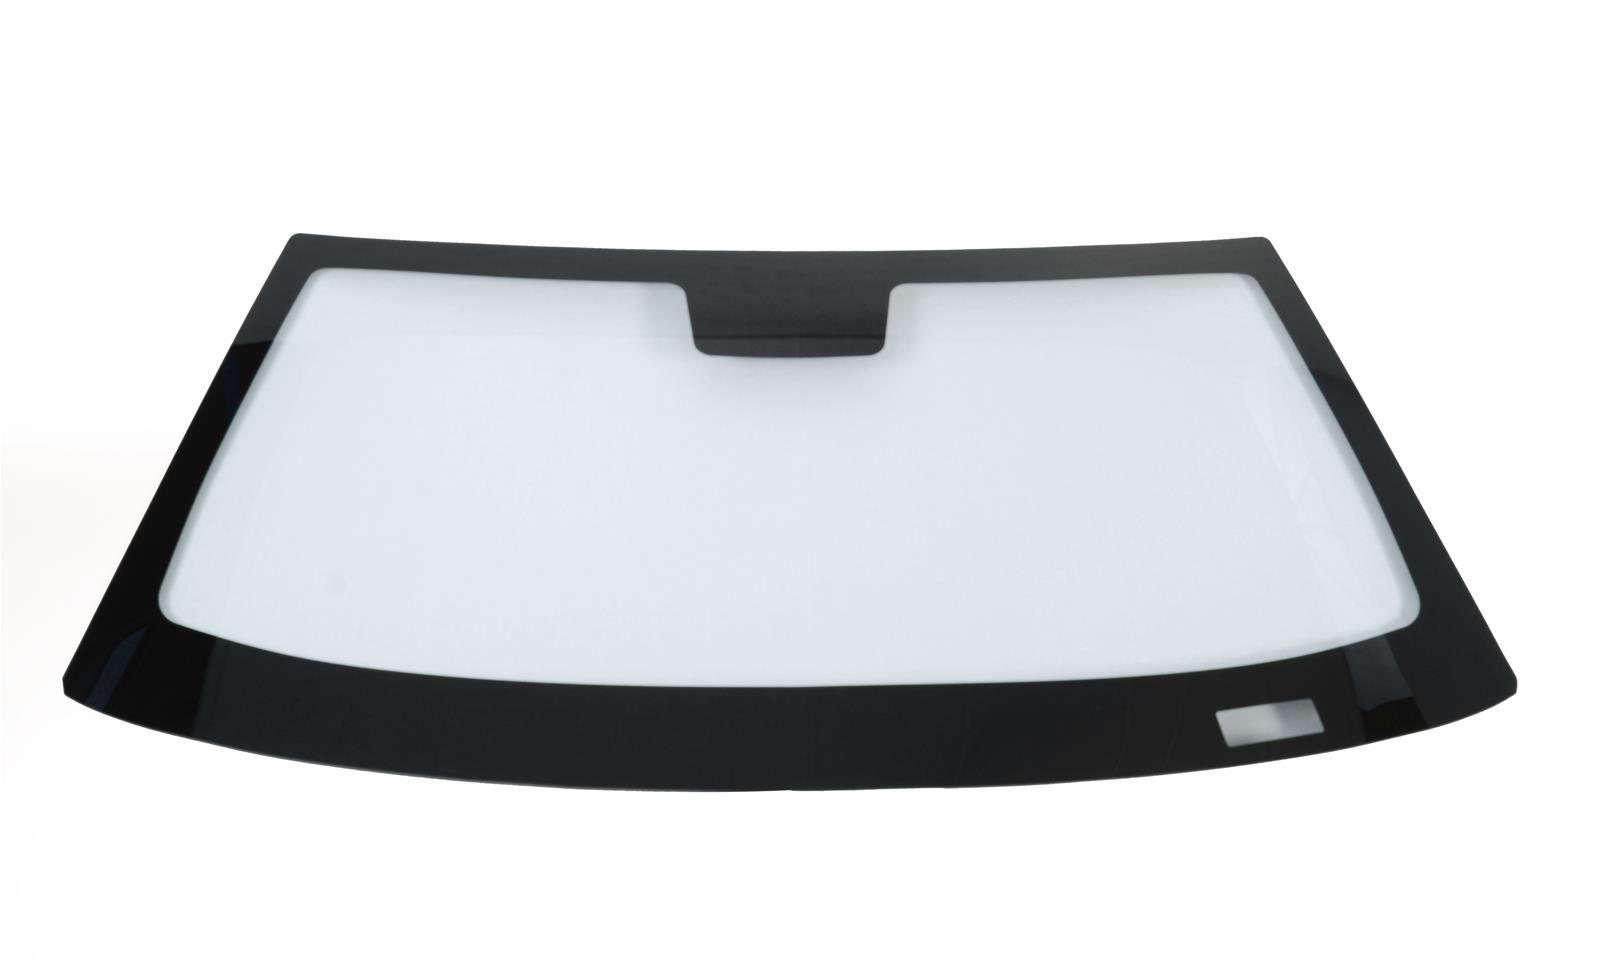 Optic Armor Windows Window Frt Camaro 93-02 1/4in Black-Out